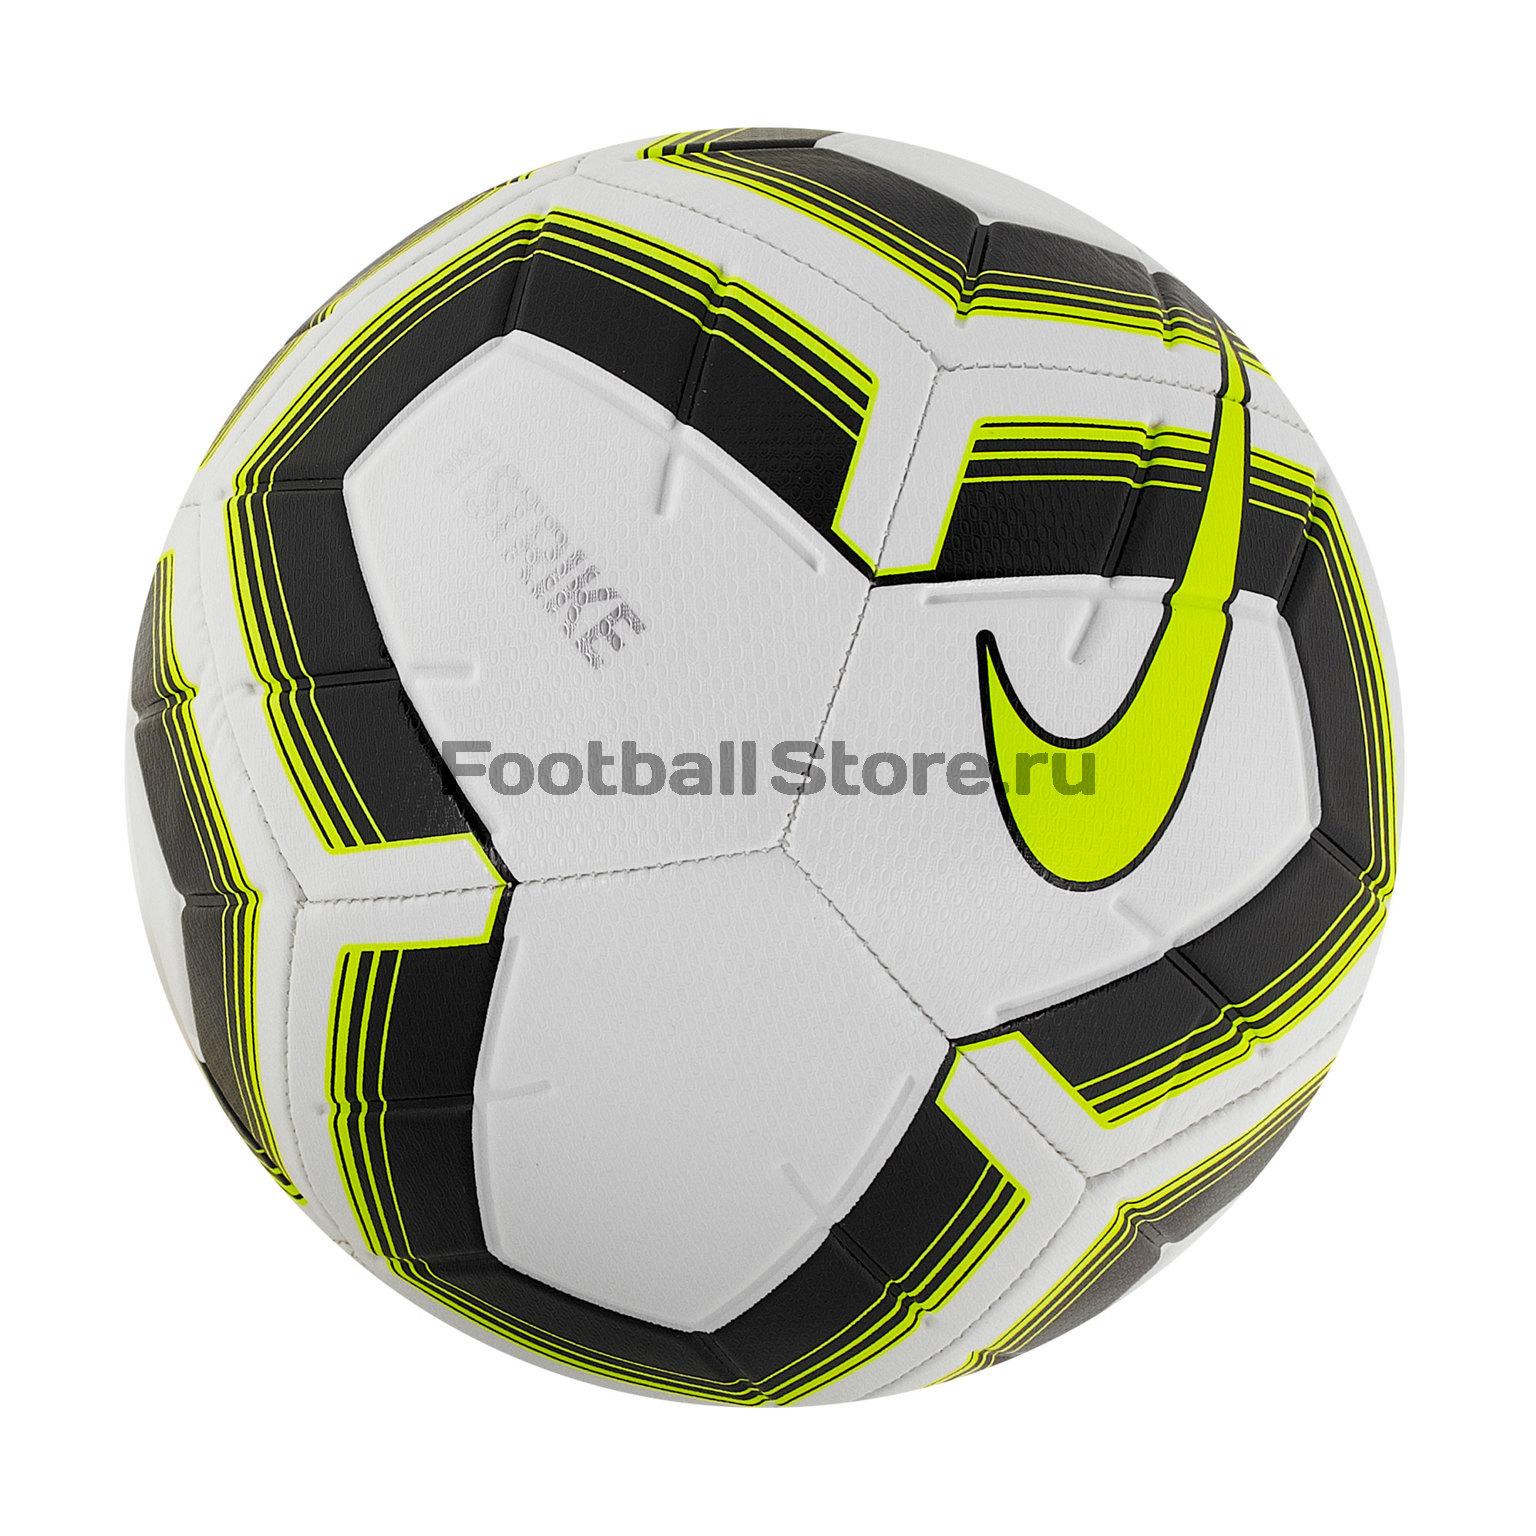 Фото - Футбольный мяч Nike Strike Team SC3535-102 футбольный мяч nike barcelona strike sc3365 455